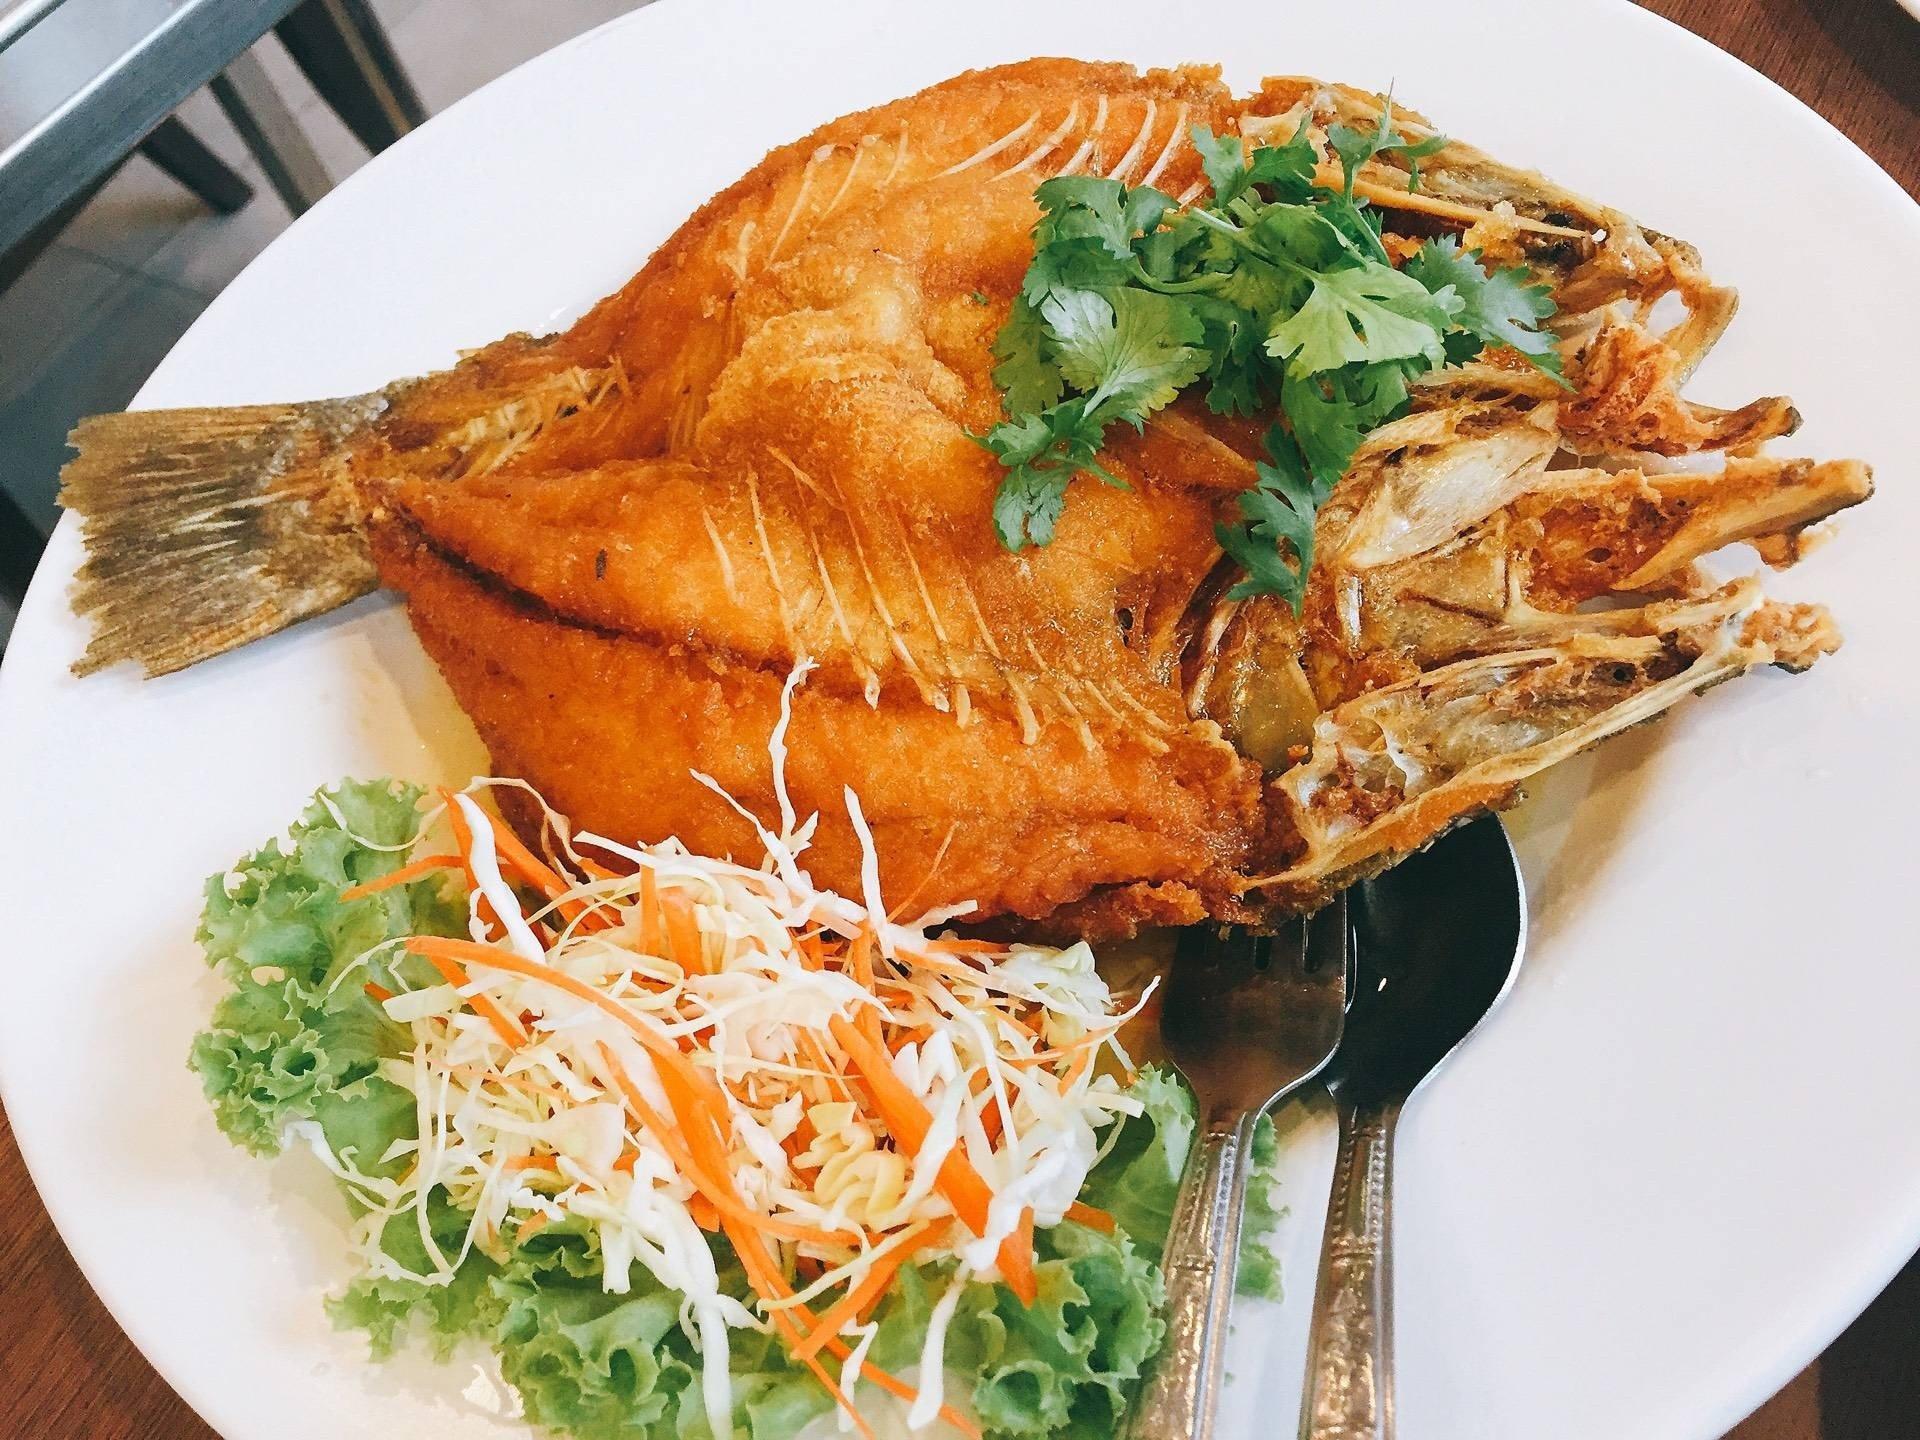 Image result for ปลากระพงทอดน้ำปลา somboon